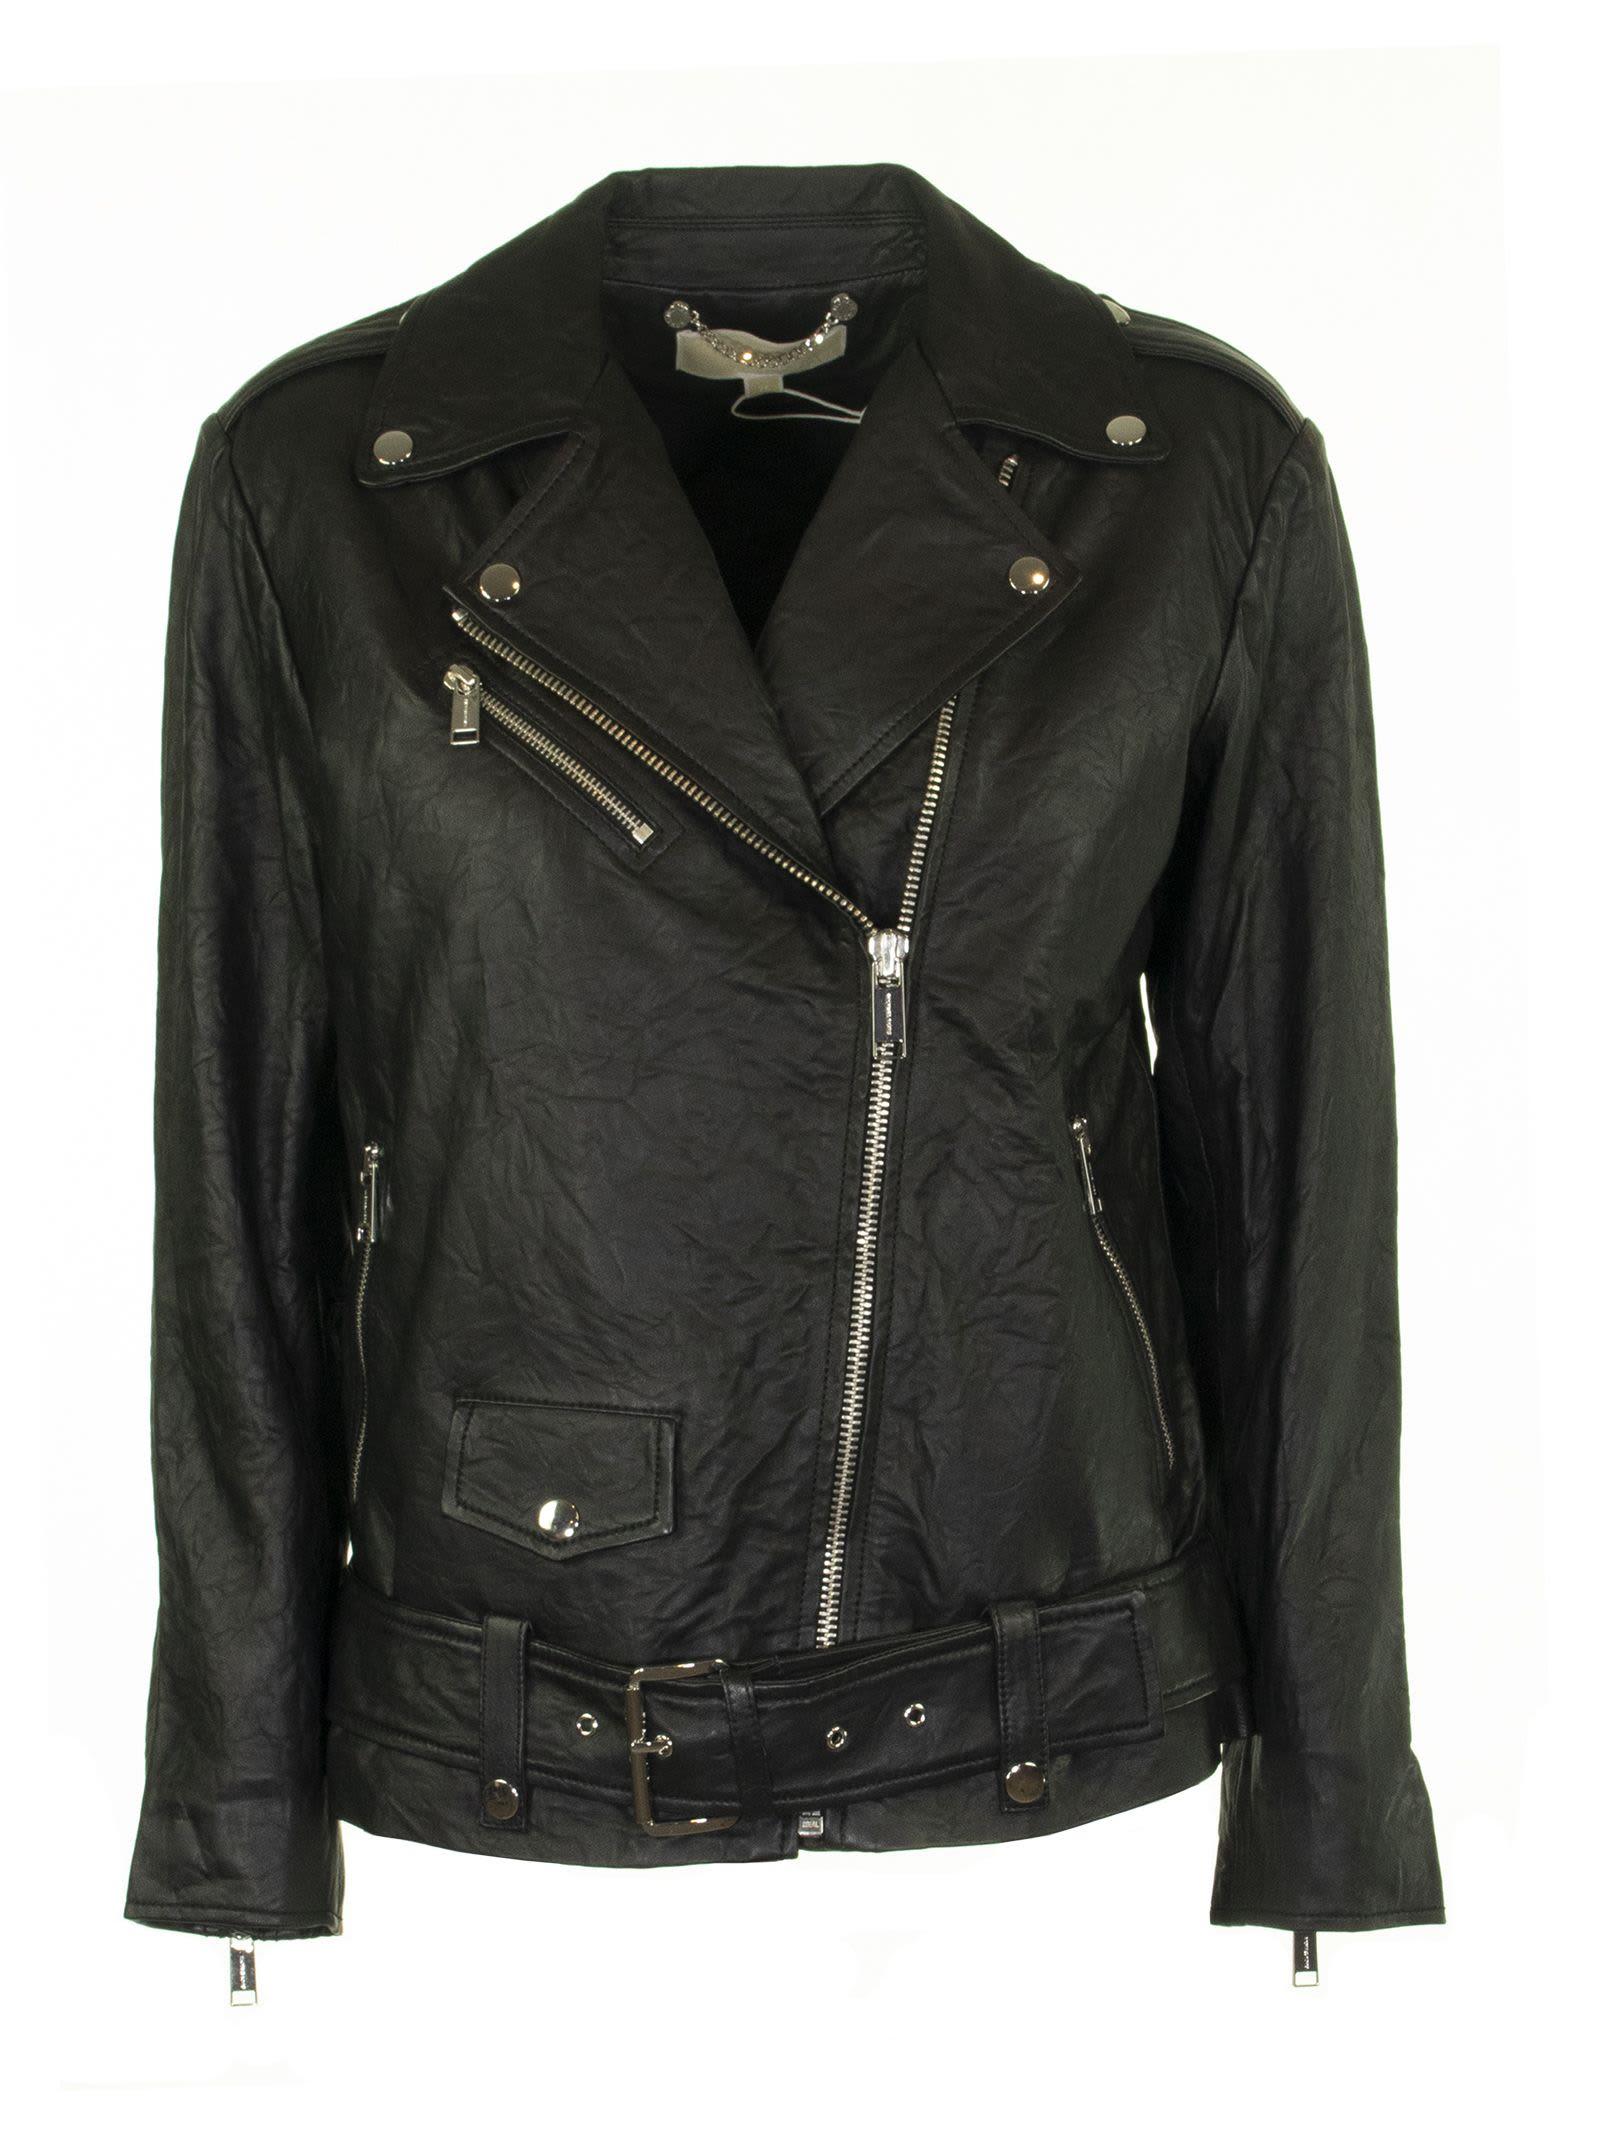 Michael Kors Crinkled Leather Moto Jacket Black